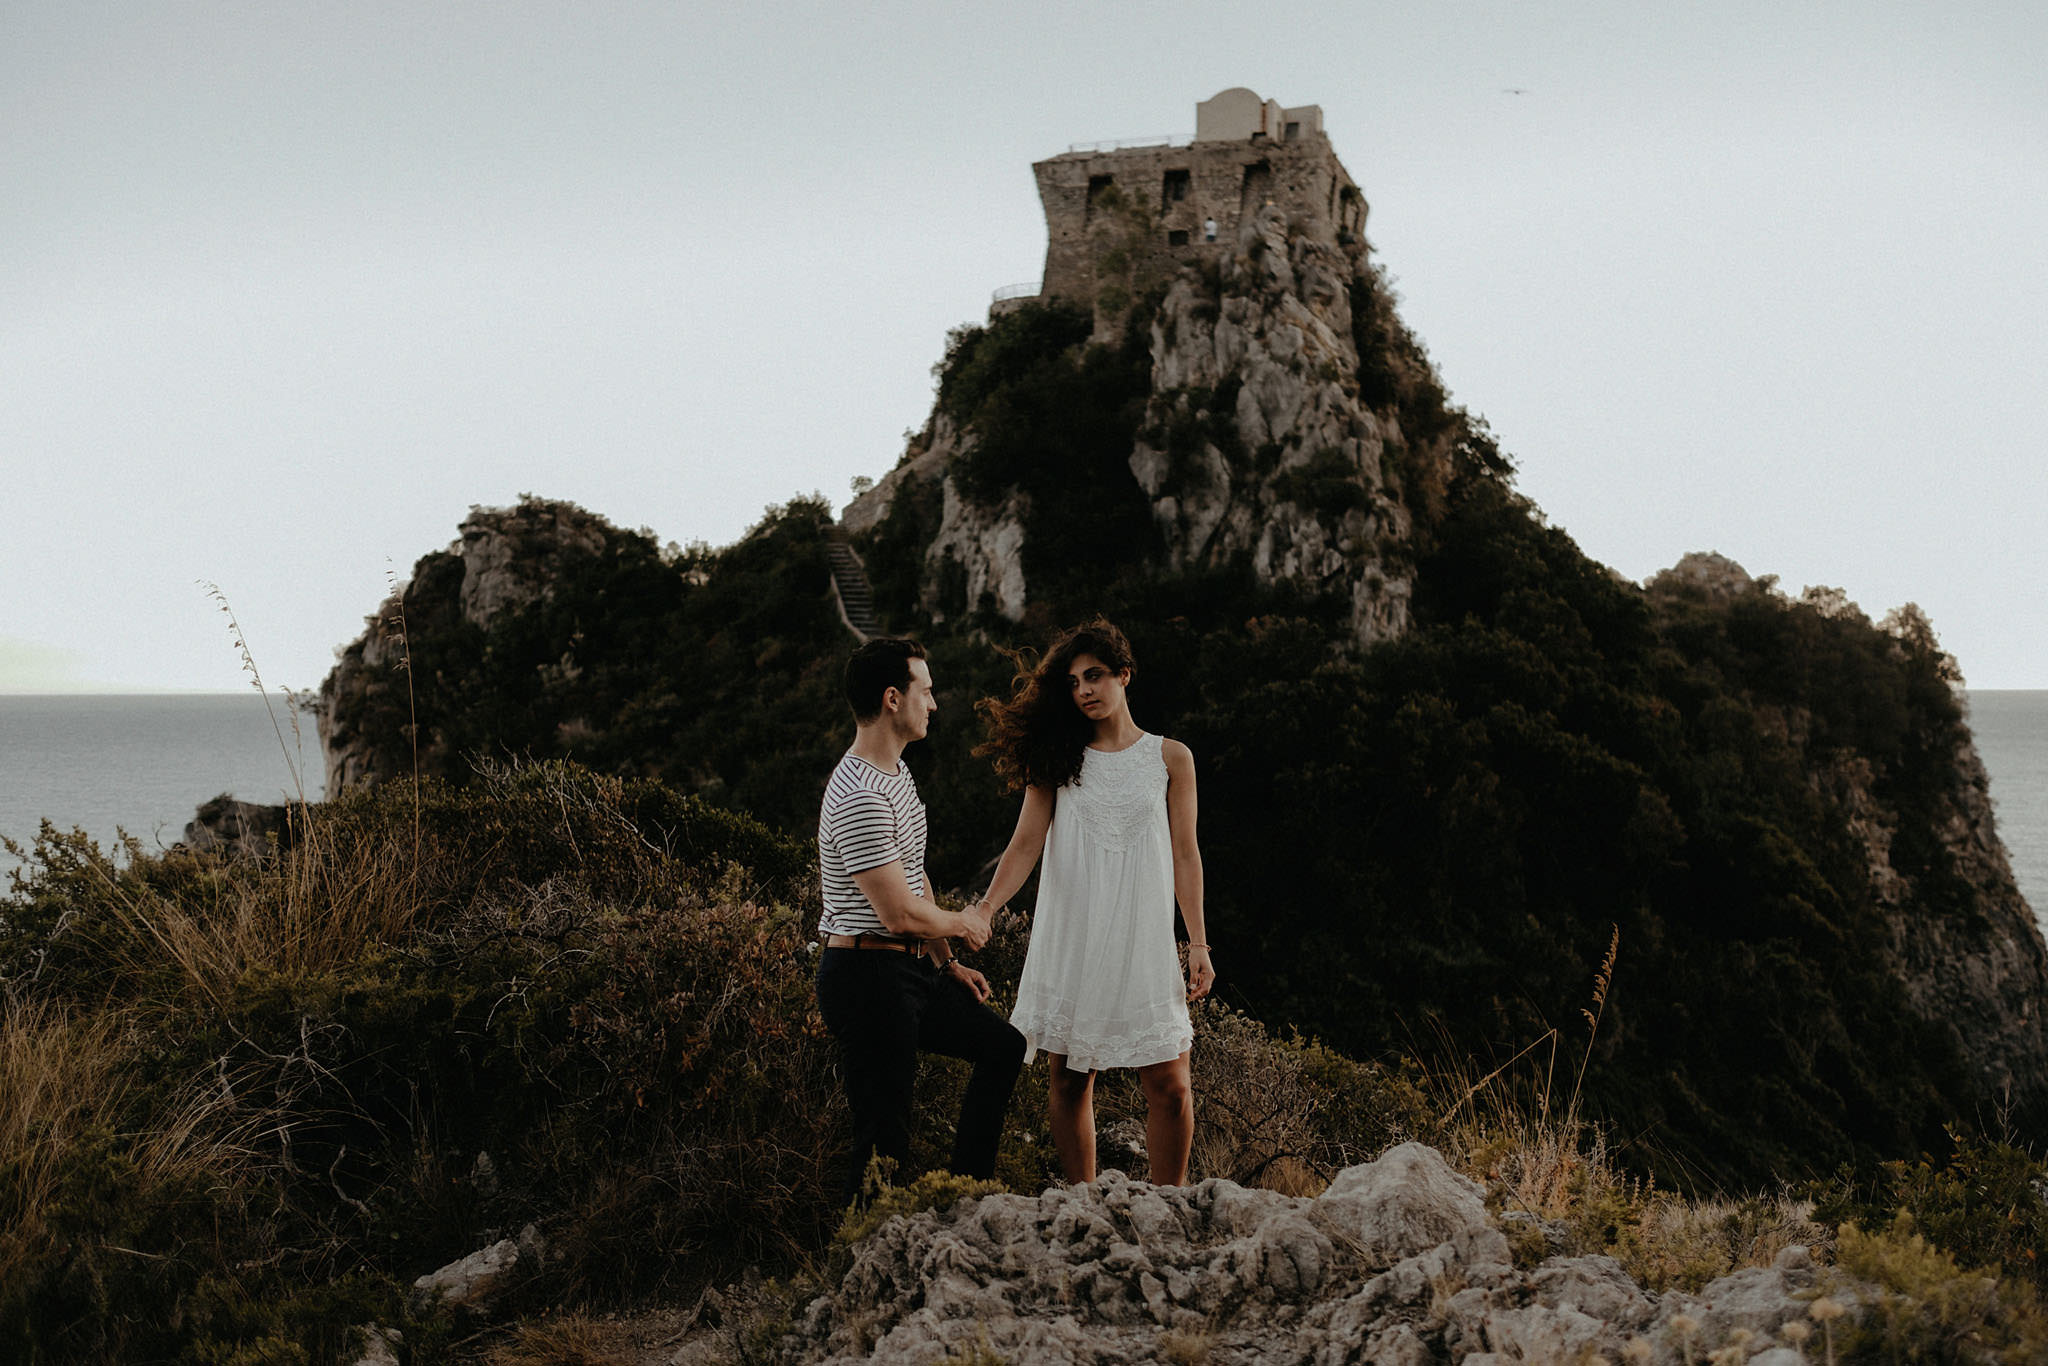 Max-Steph-Italy-Wedding-879.jpg